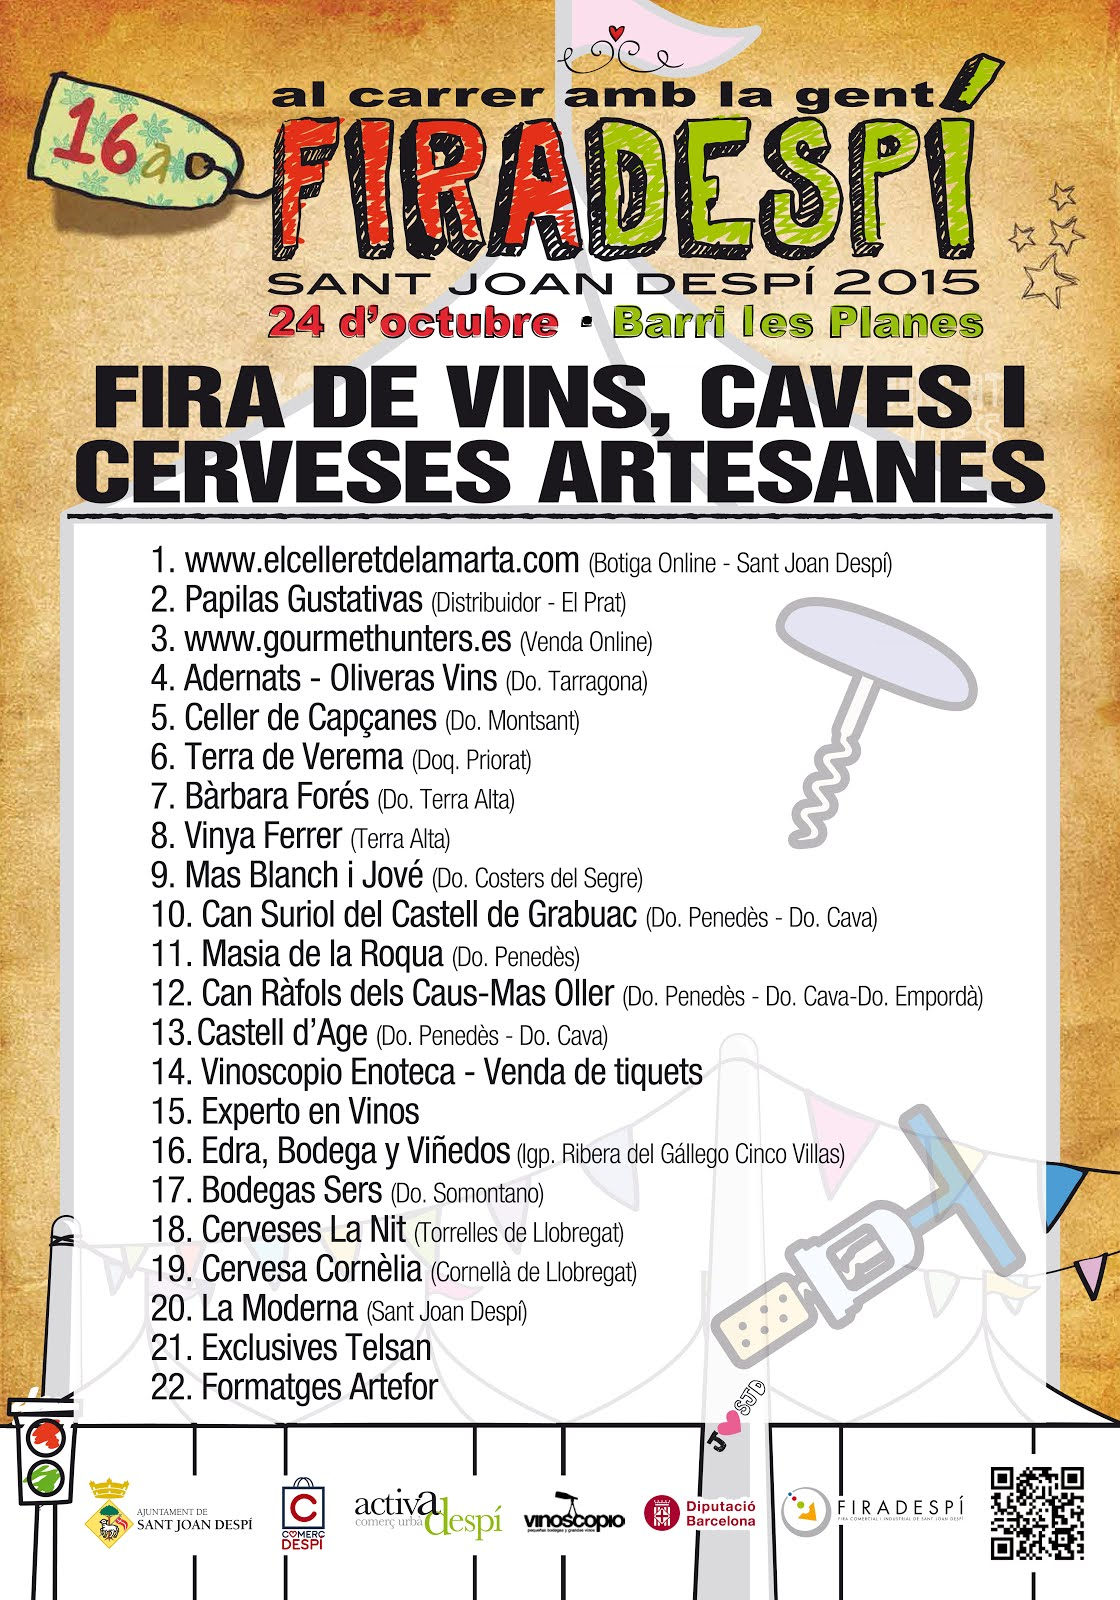 2ª FIRA DE VINS, CAVES I CERVESES ARTESANES DE SANT JOAN DESPÍ